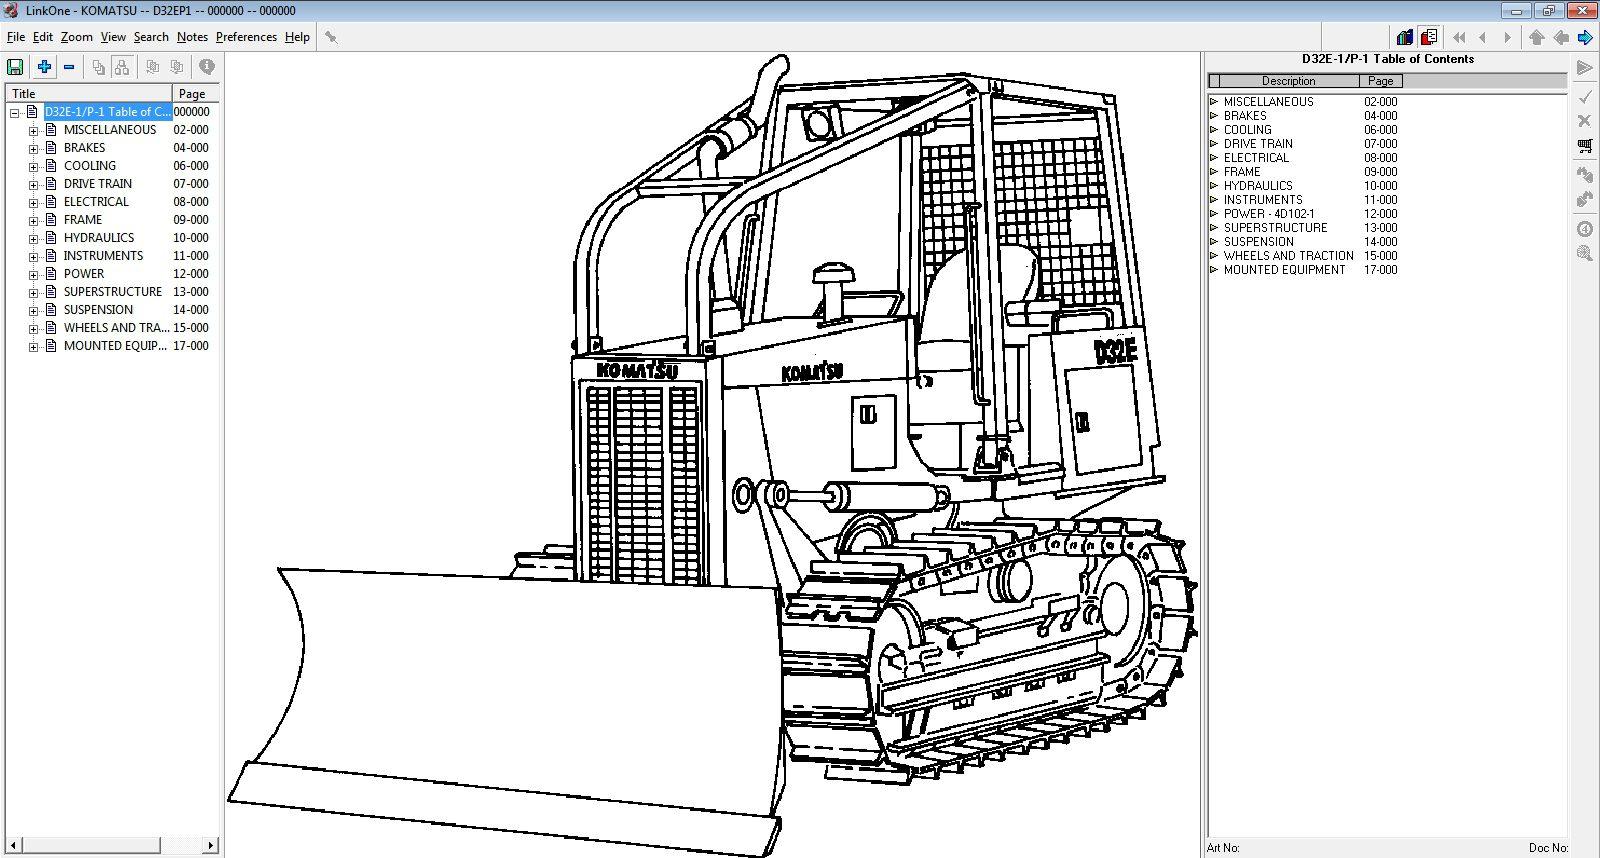 Komatsu_LinkOne_Parts_Catalogue_EPC_USA_112018_Offline_1